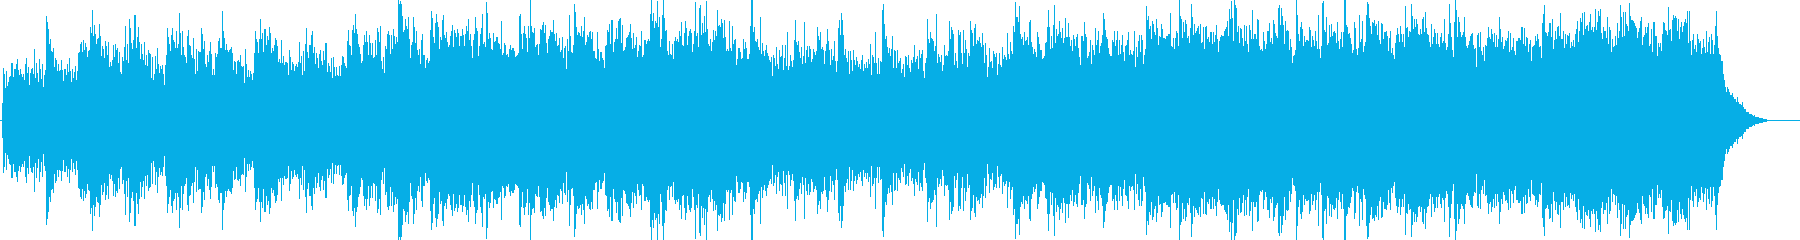 Península de Yucatánの再生済みの波形